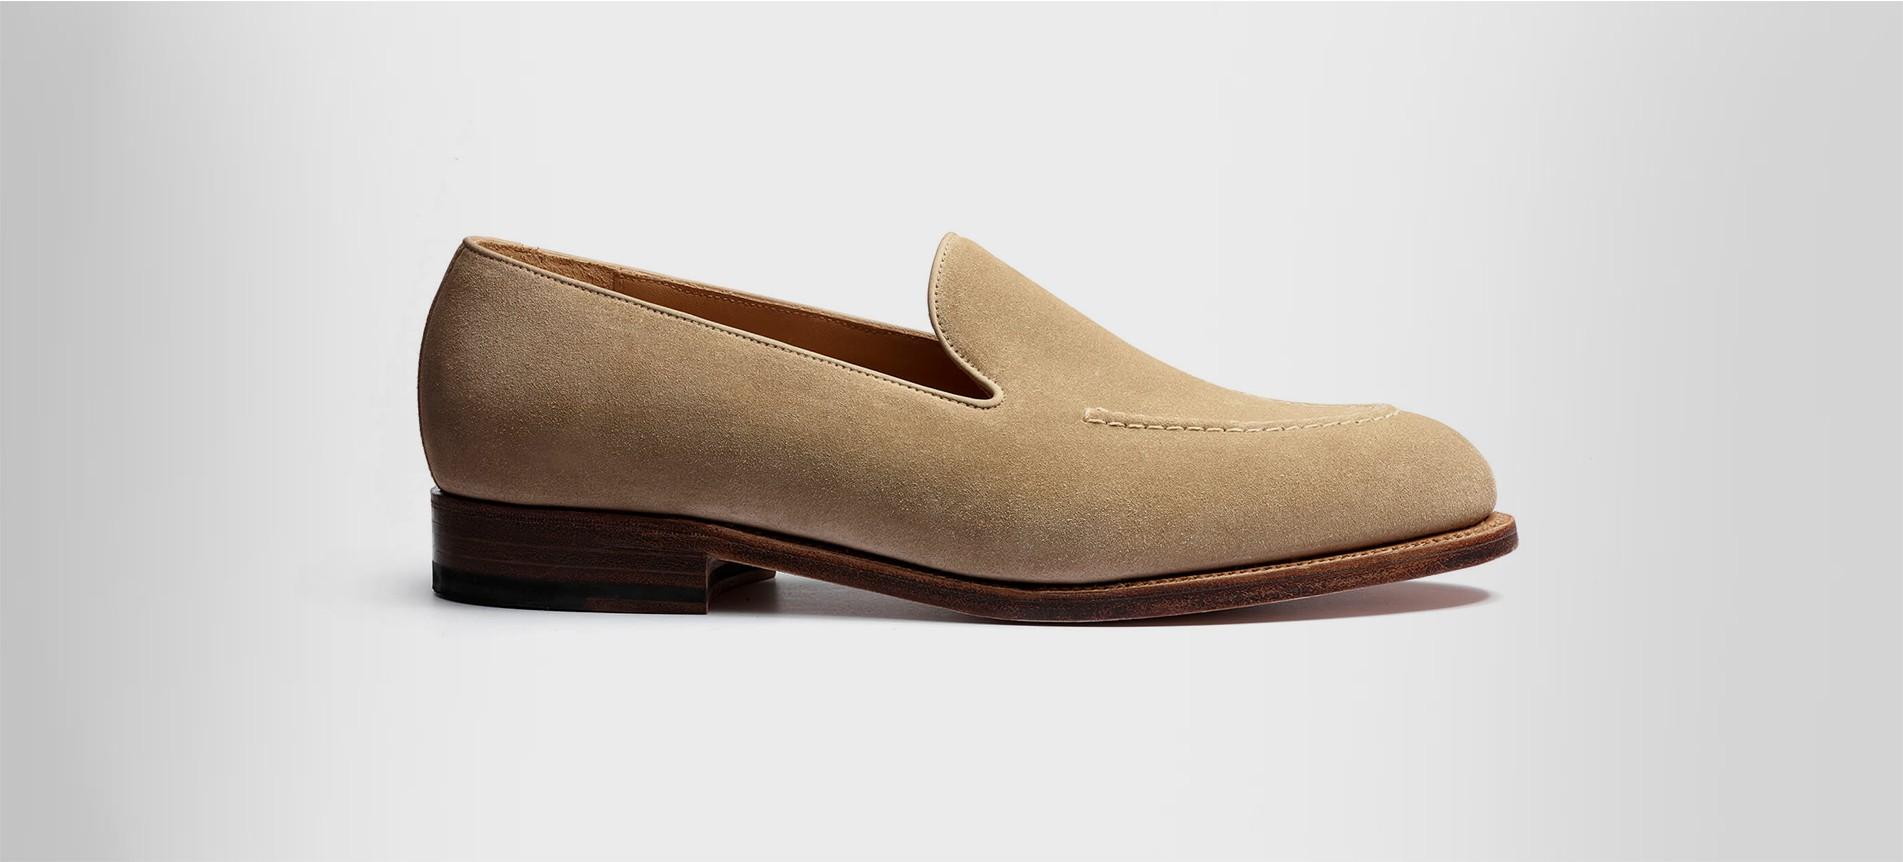 Menton loafer Beige suede calfskin